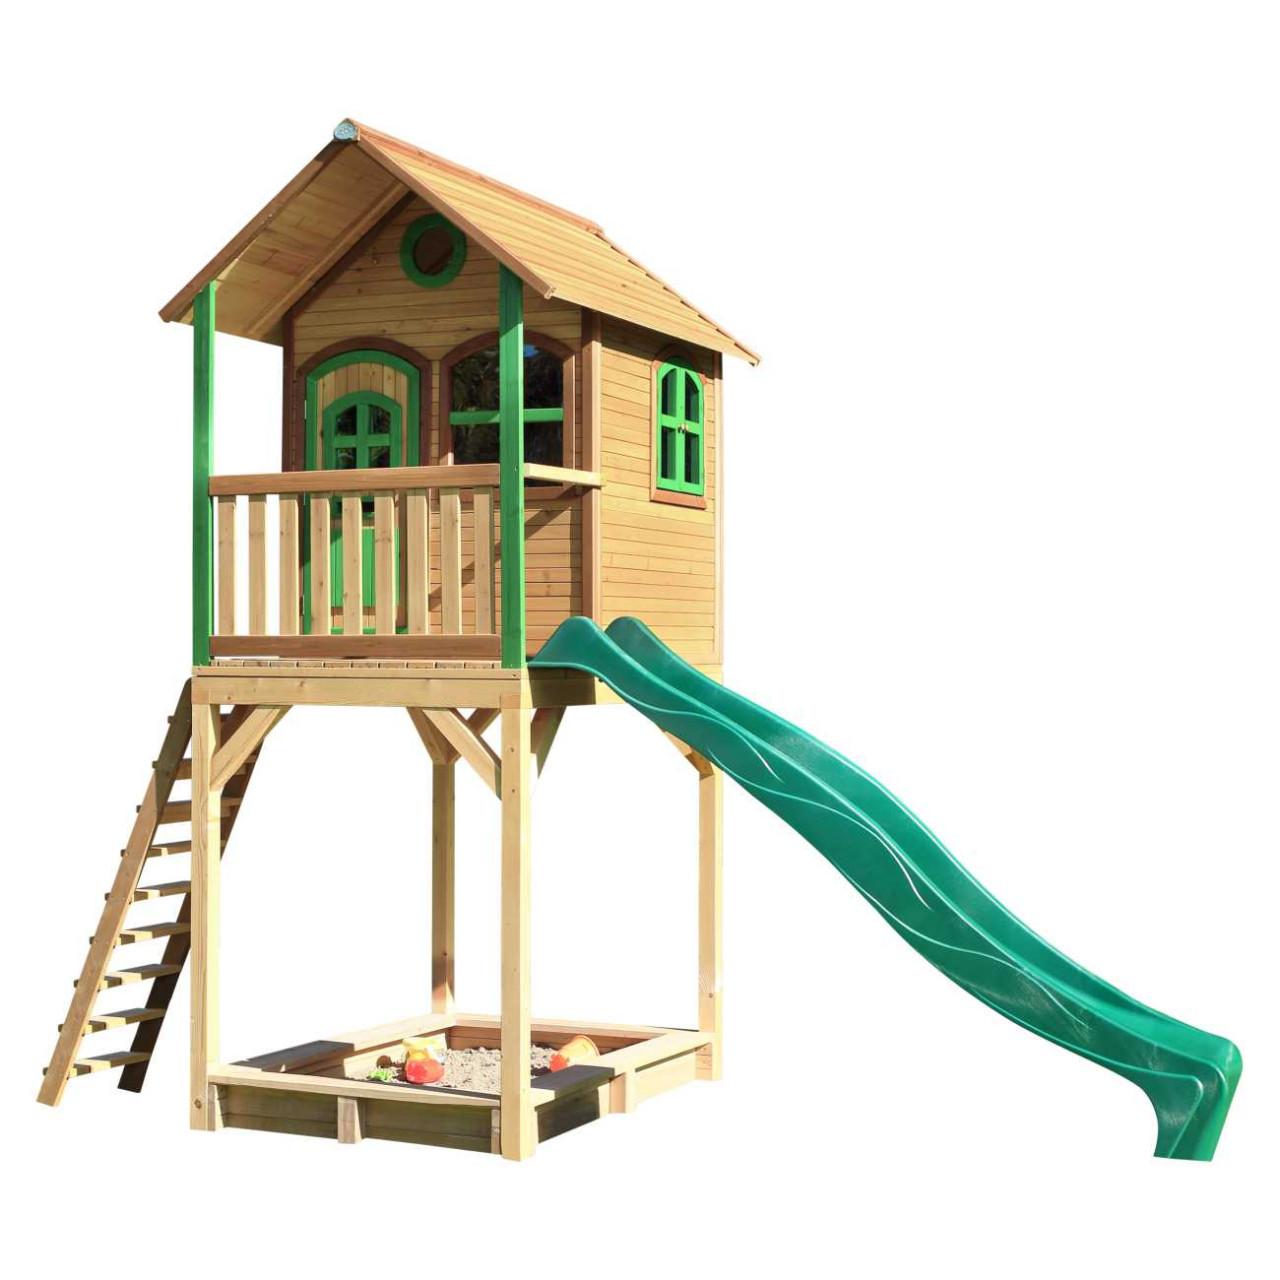 Axi Stelzenhaus Romy, Kinder Spielhaus